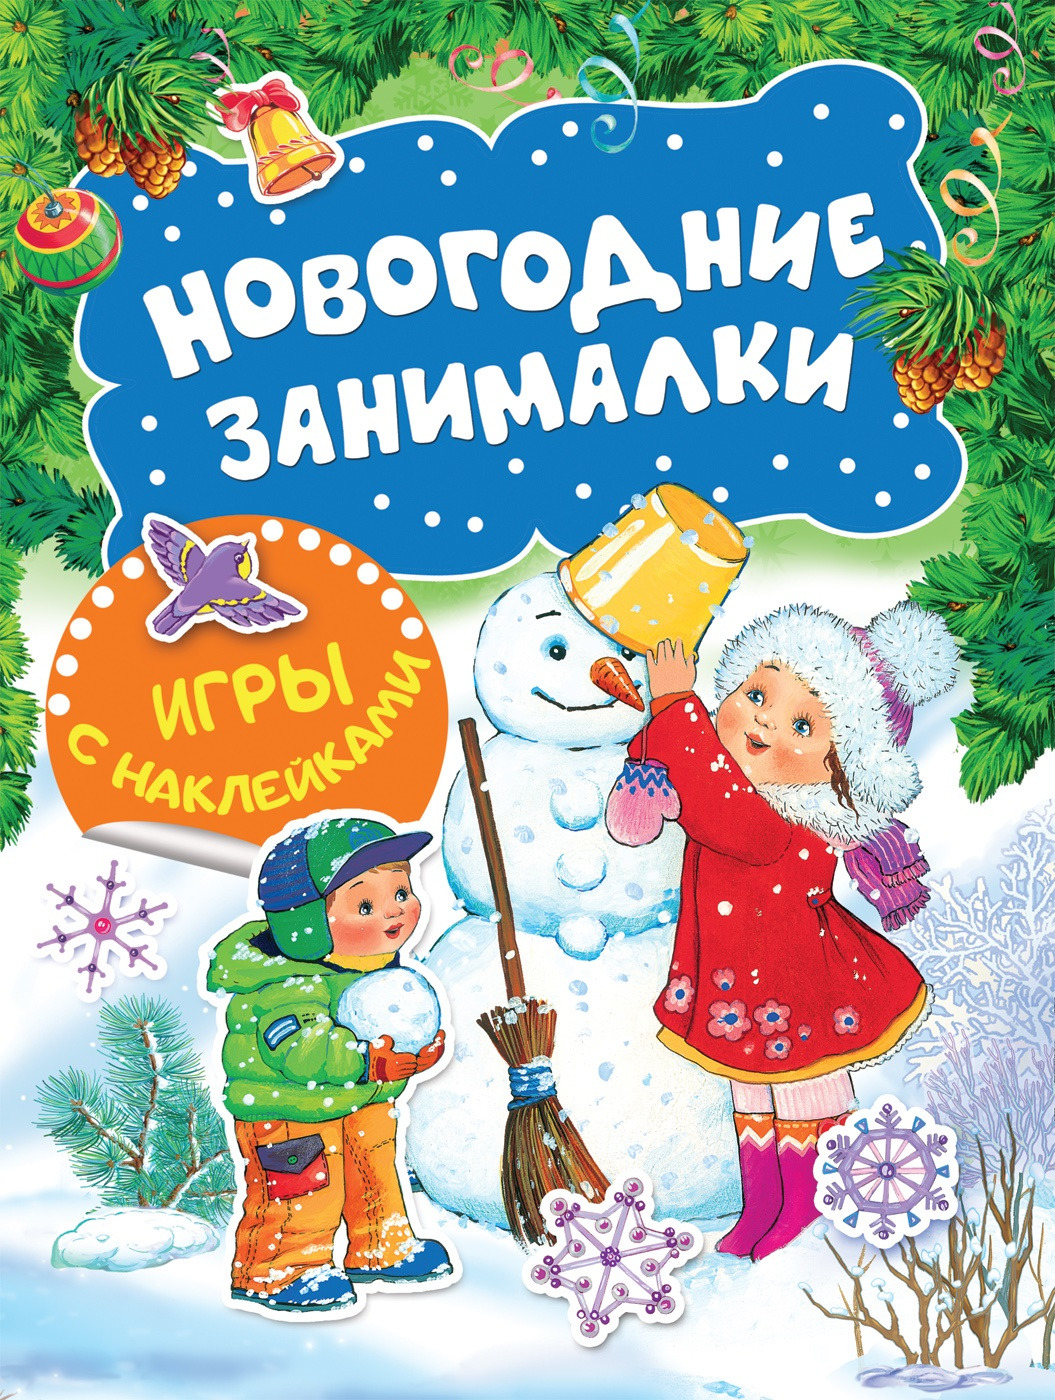 Н. И. Котятова Новогодние занималки. Игры с наклейками (Снеговичок)